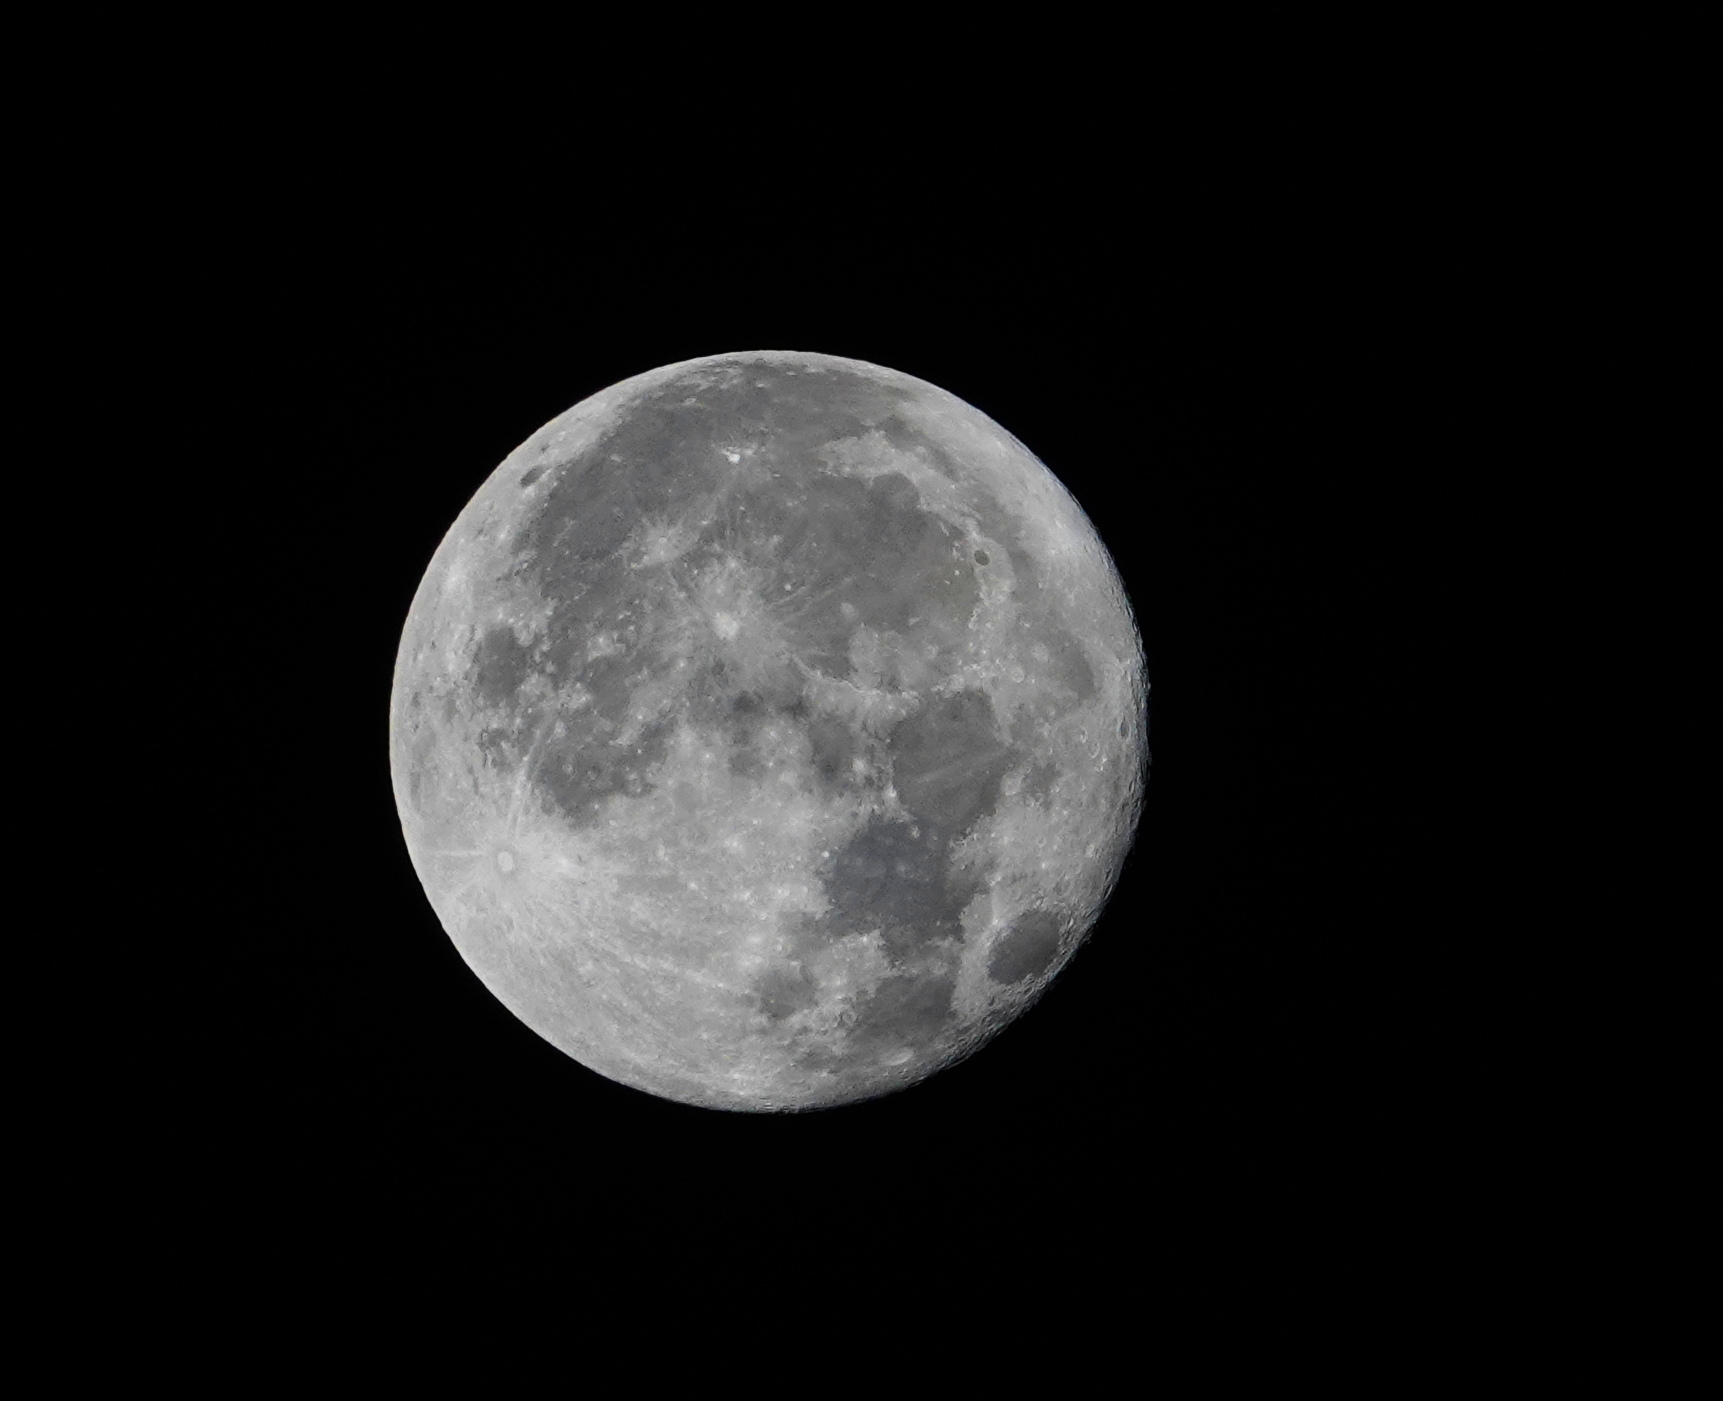 5d7dd1490f1c6_lune4.JPG.e25ebd0abfd7ce15a0adaf368ae33995.JPG